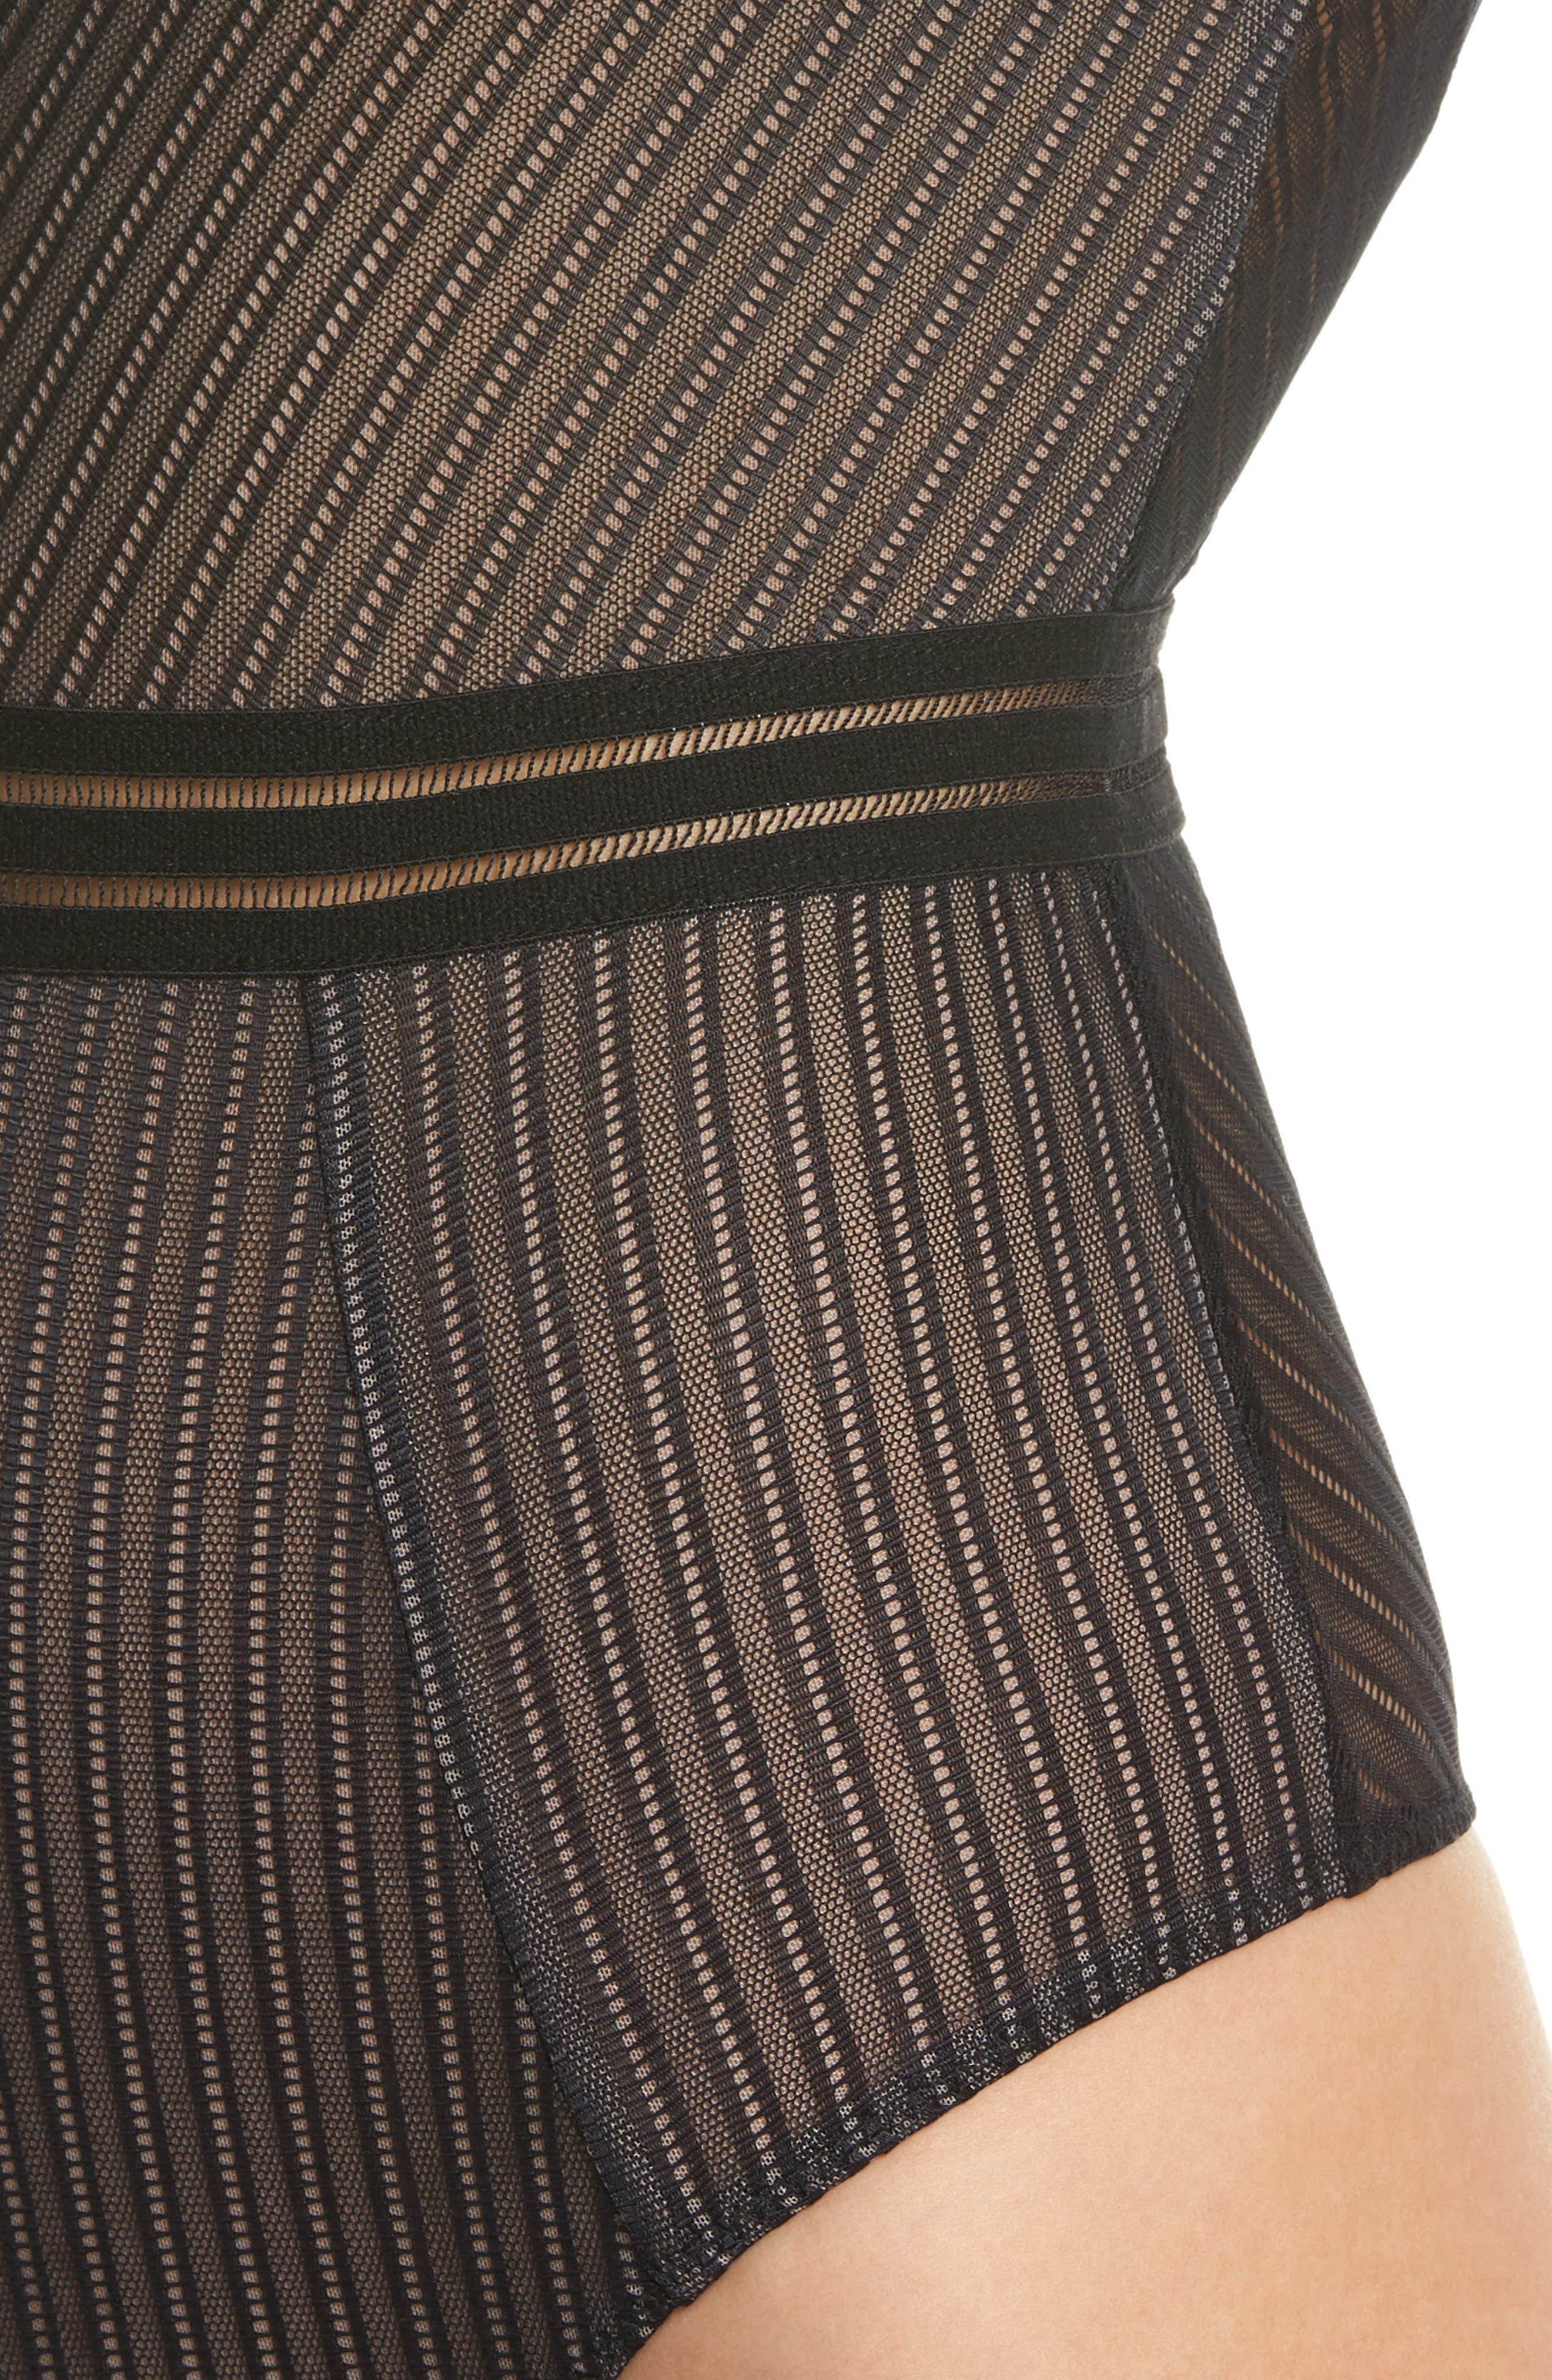 Arabella Thong Bodysuit,                             Alternate thumbnail 4, color,                             001